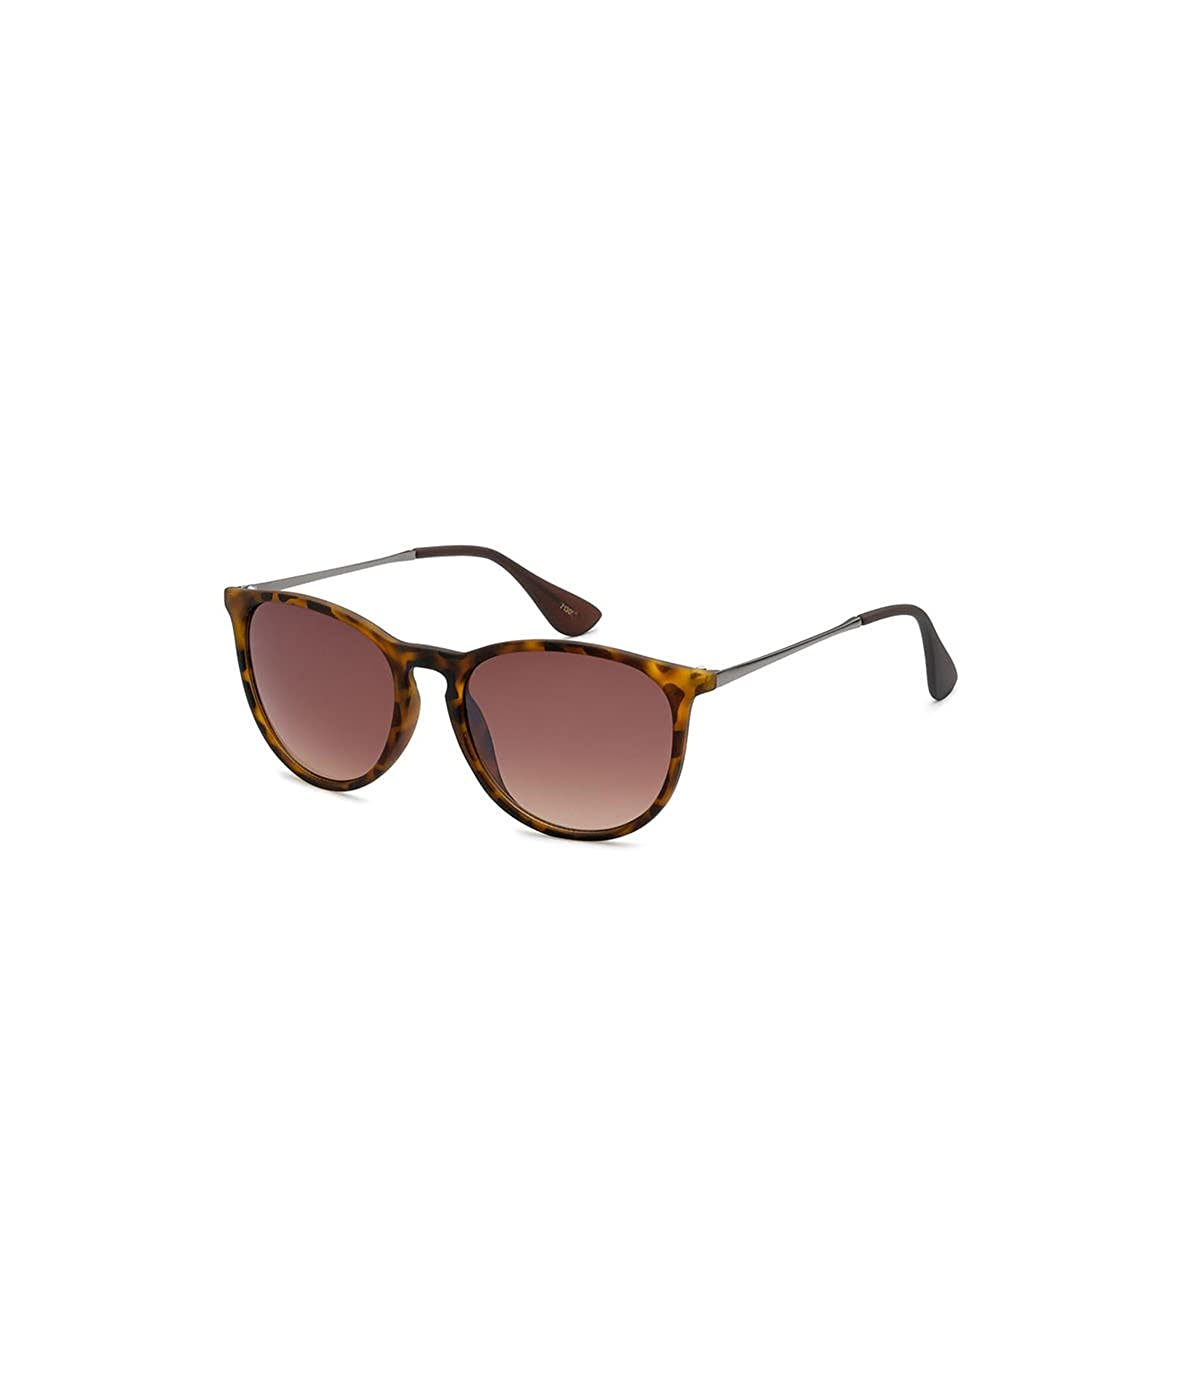 18c350475e Amazon.com  Nayked Apparel Matte Sunglasses